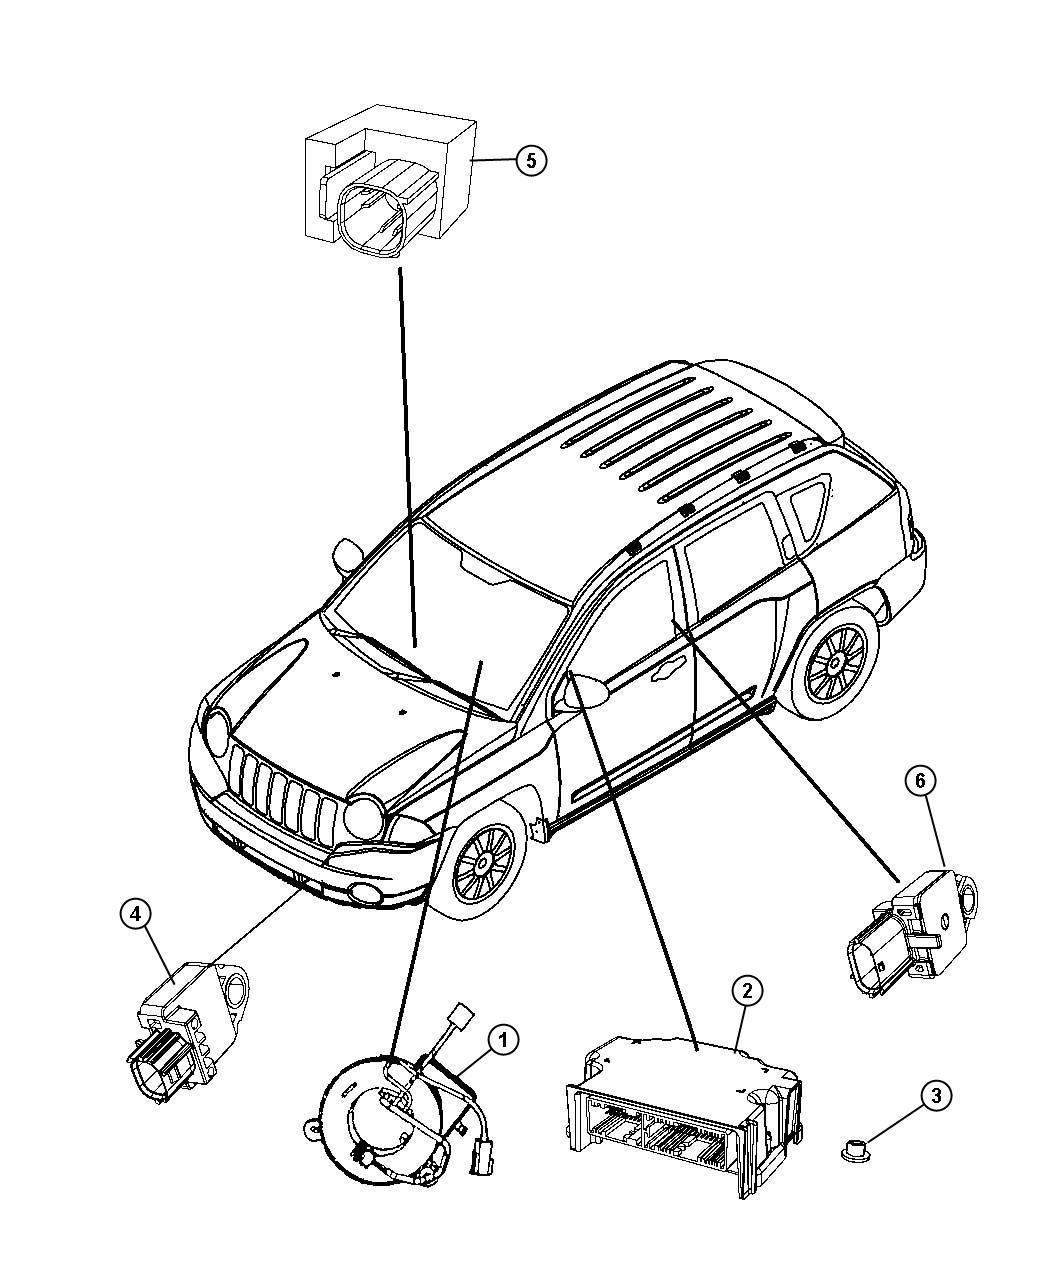 2011 Dodge Caliber Air Bag Modules, Impact Sensors and